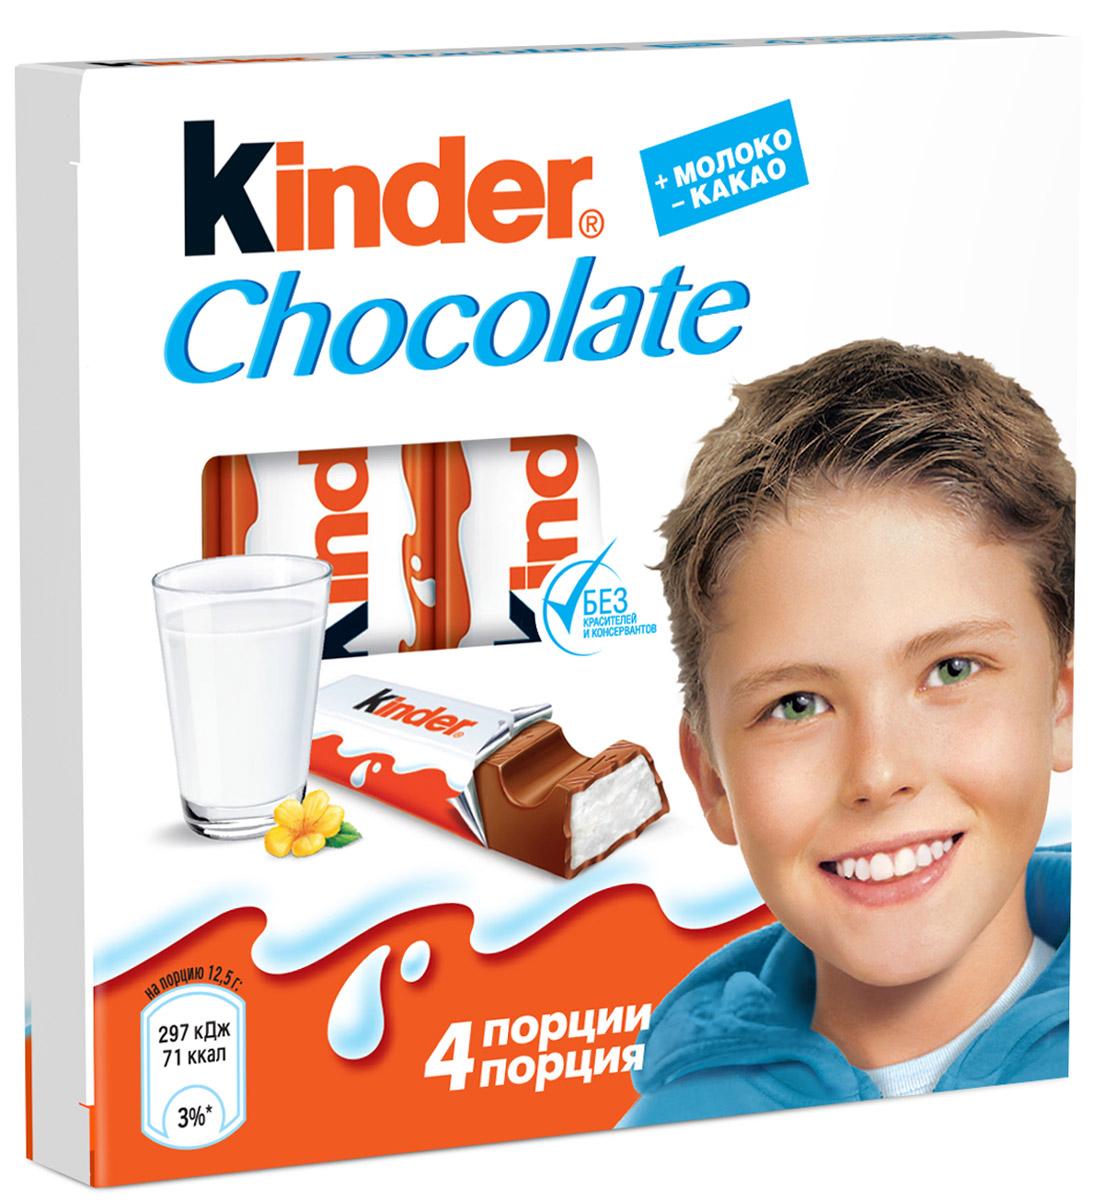 Kinder Chocolate с молочной начинкой, 50 г kinder choco bons конфеты из молочного шоколада с молочно ореховой начинкой 46 г